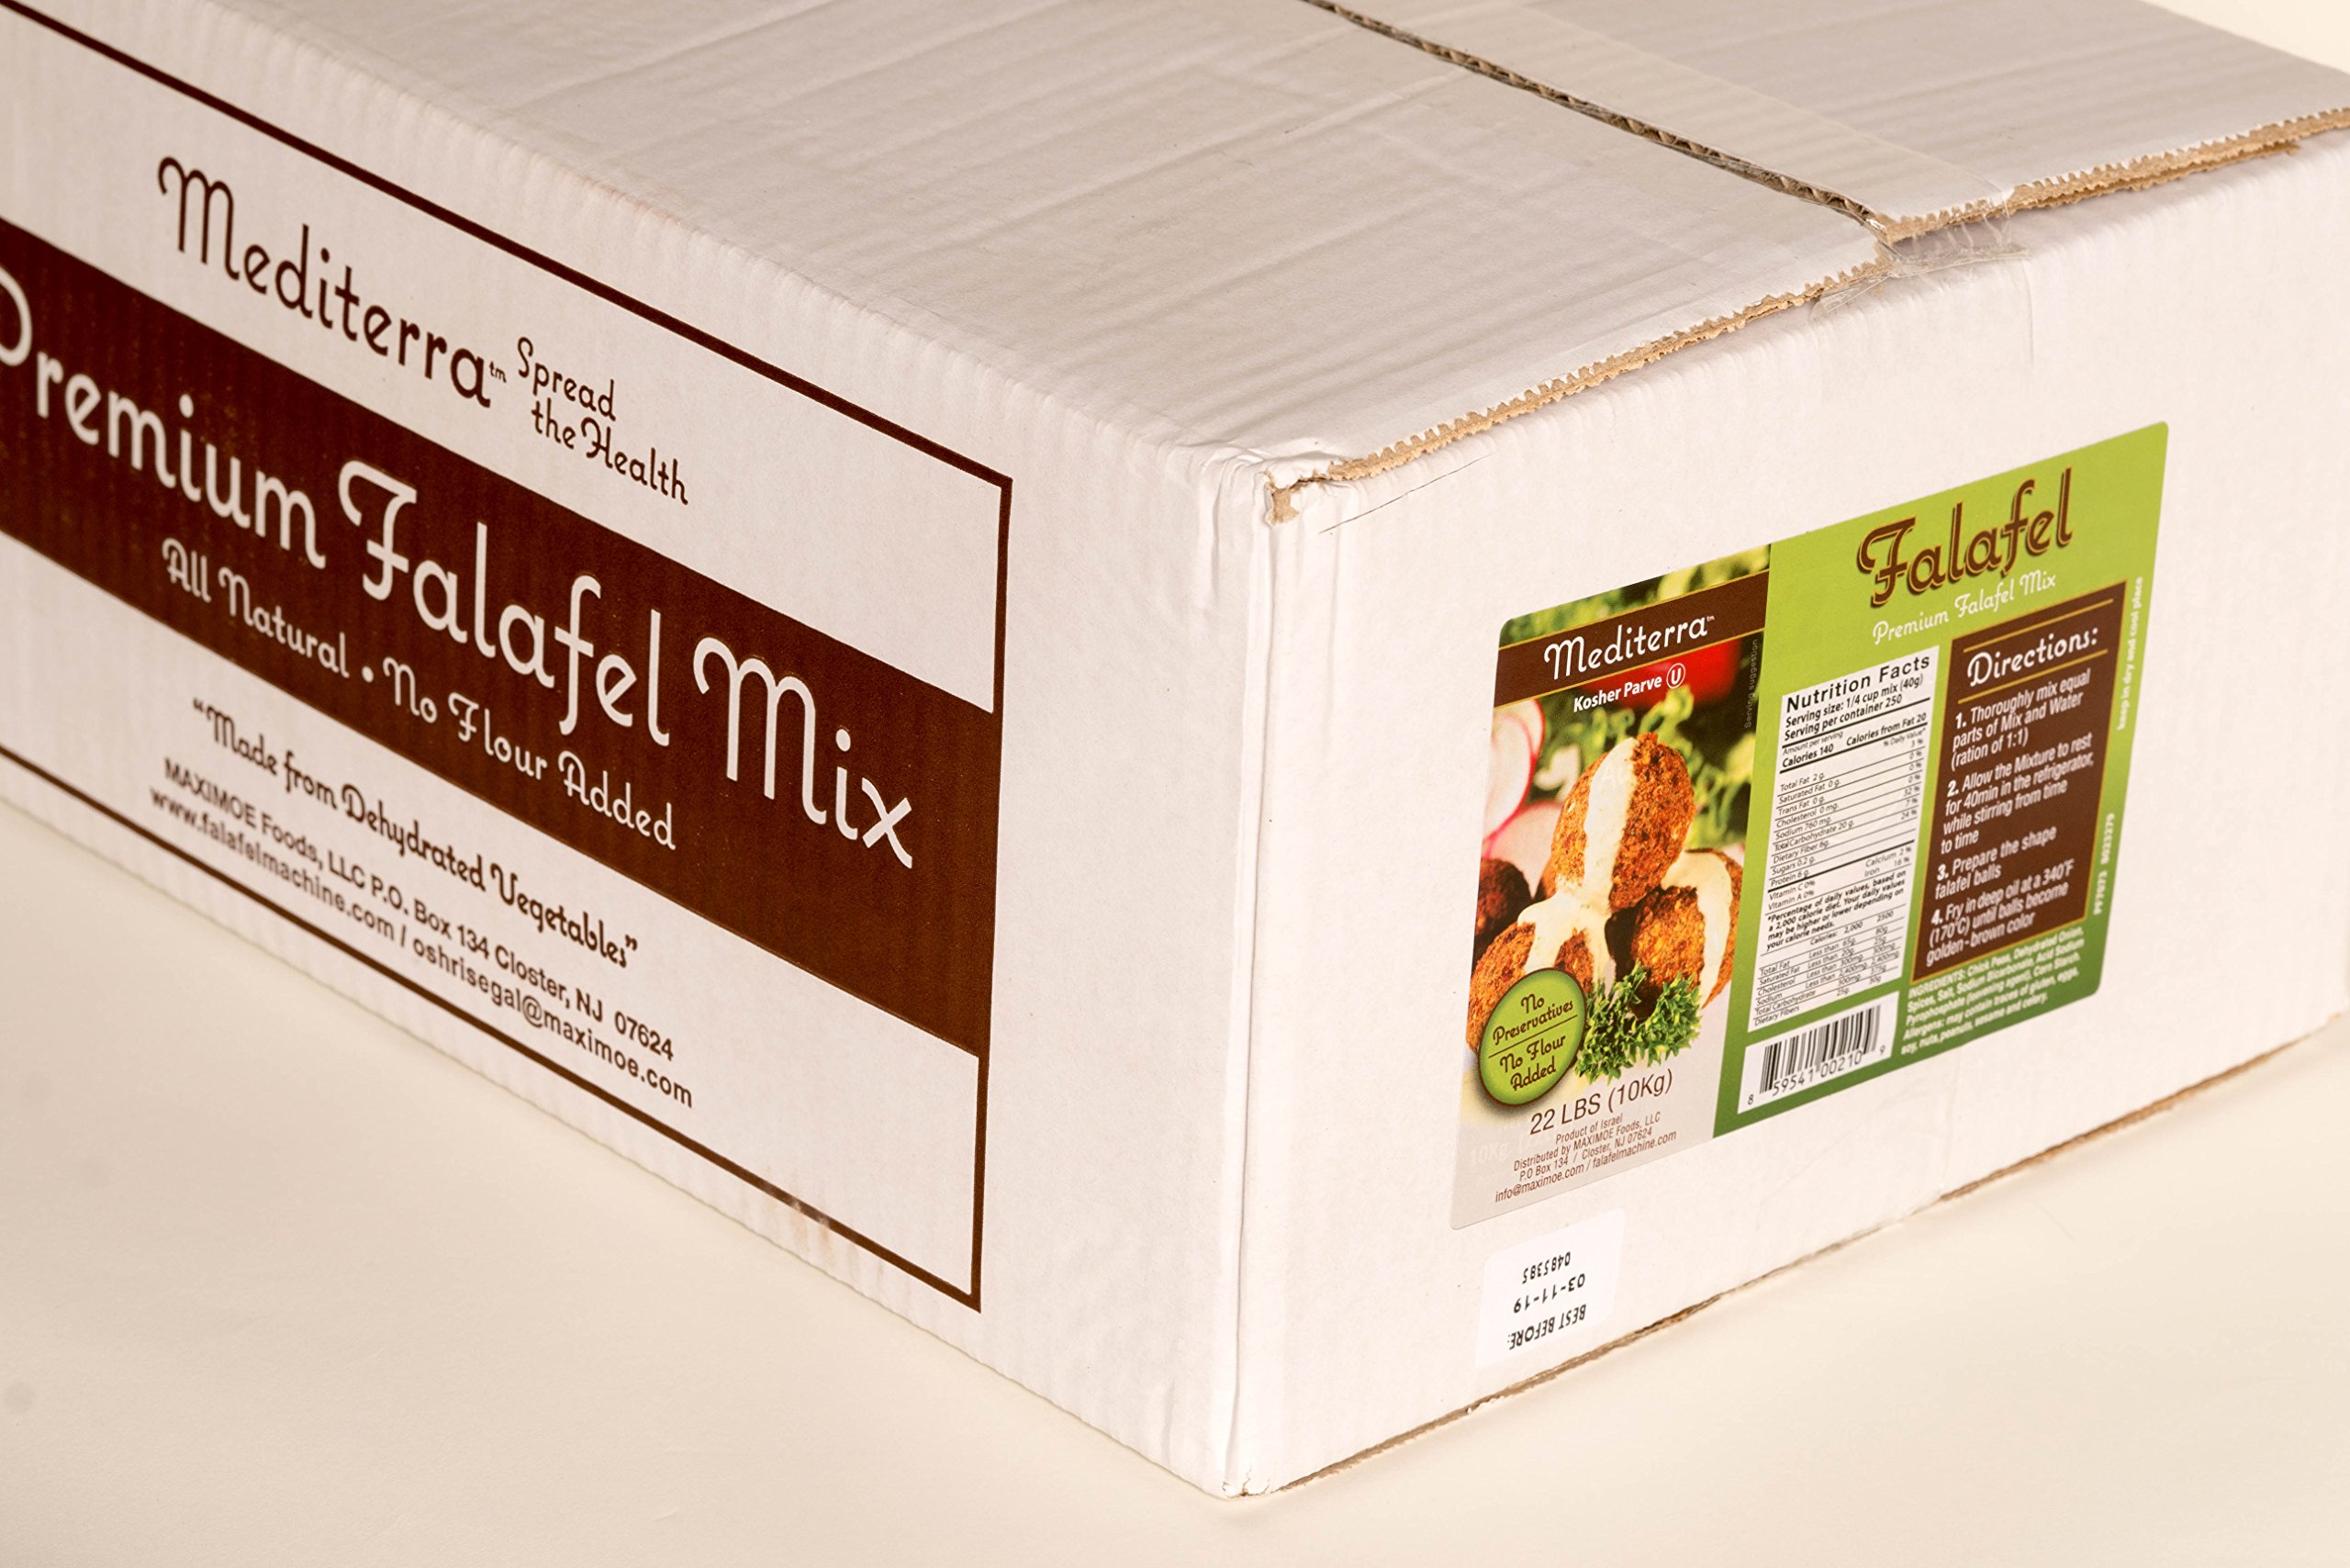 Mediterra Spread The Health Premium Falafel Mix (22 Lbs. yields 1,300 balls)